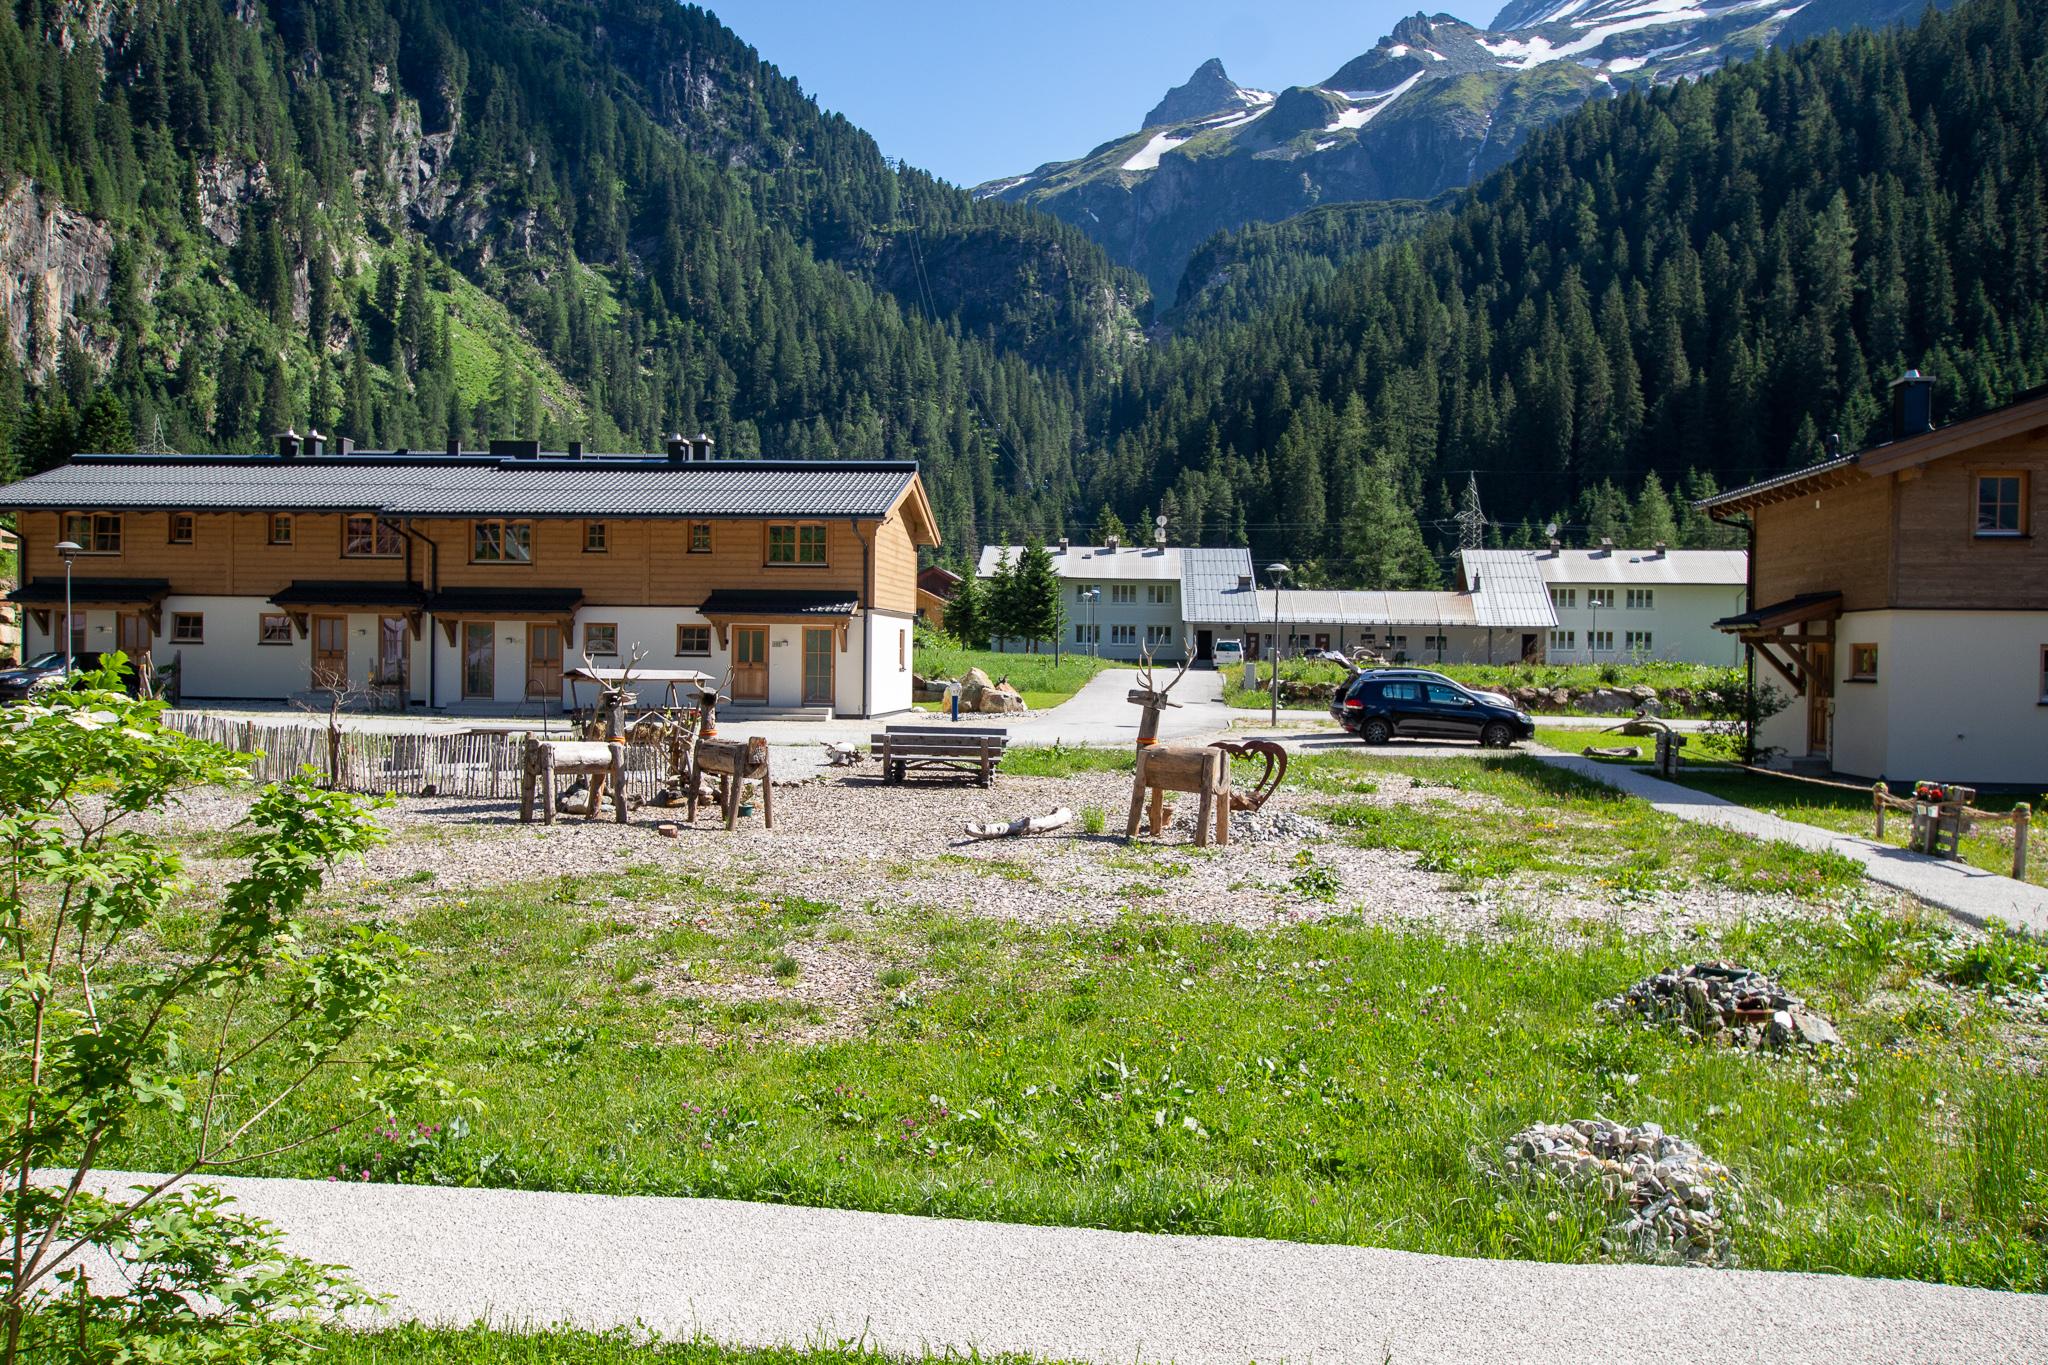 Maison de vacances Lodge Seeblick am Skilift und Bergsee für 5 (2636751), Uttendorf, Pinzgau, Salzbourg, Autriche, image 37